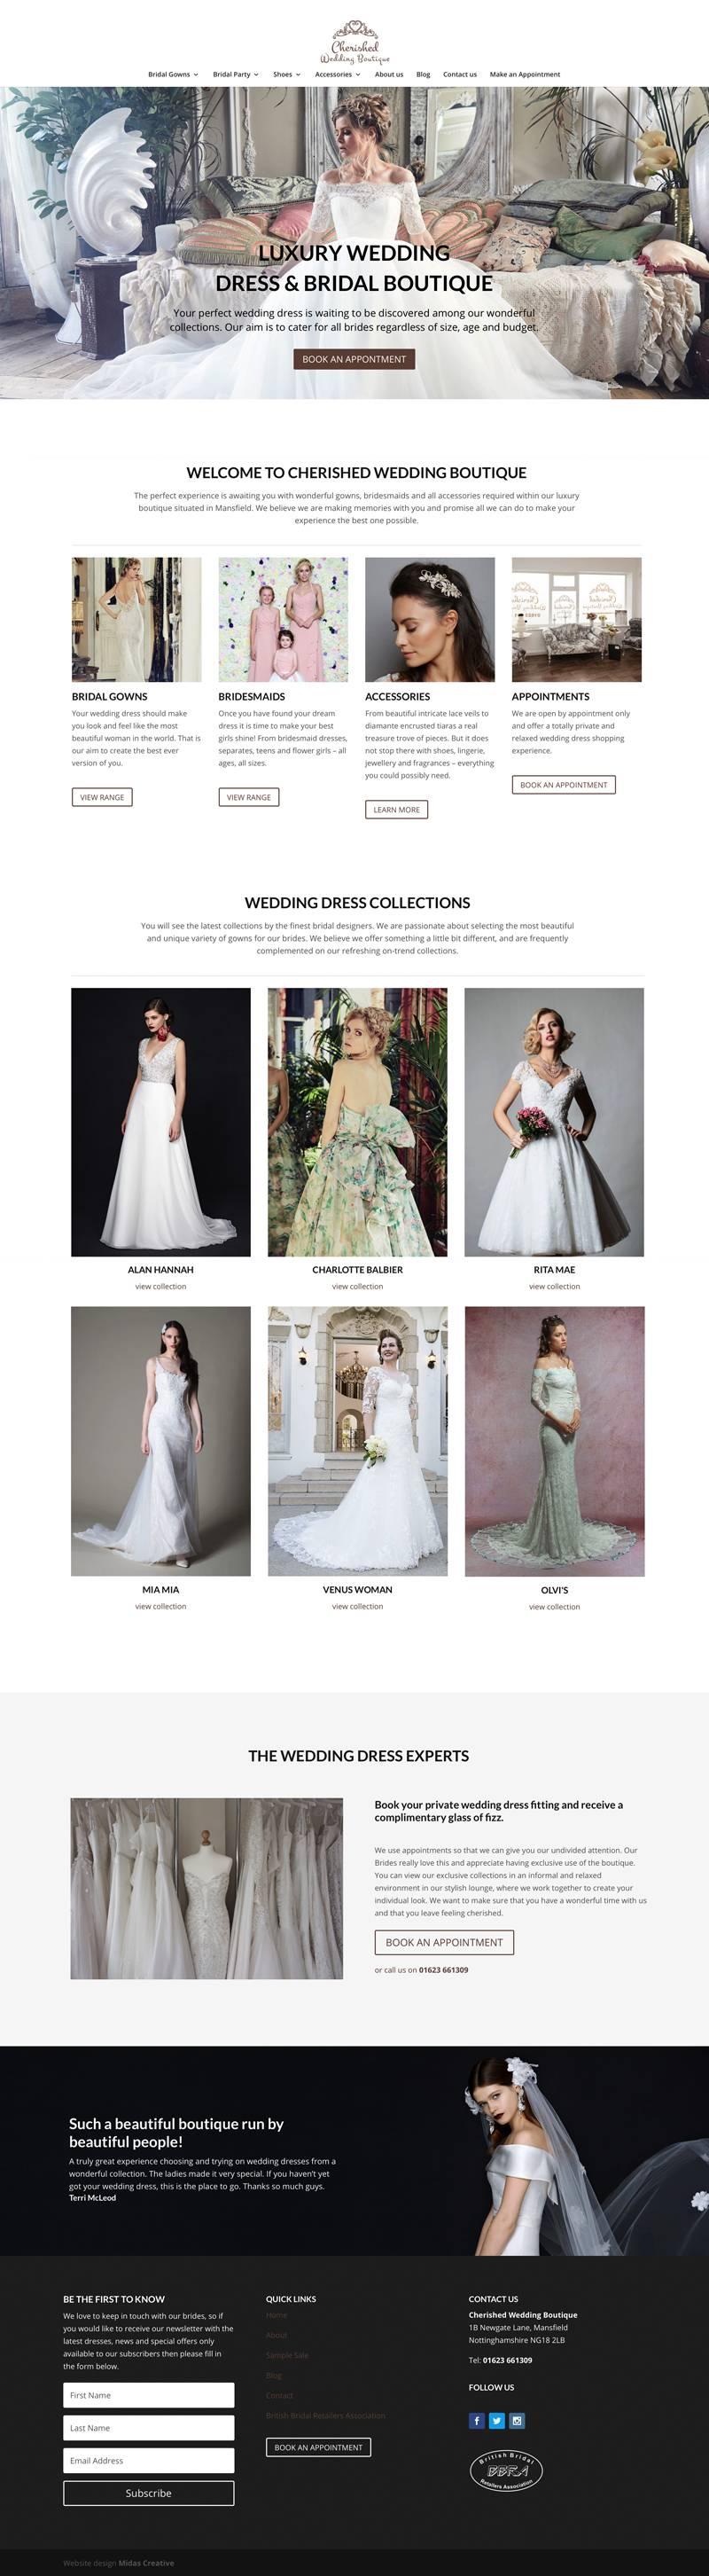 wedding dress shop website design